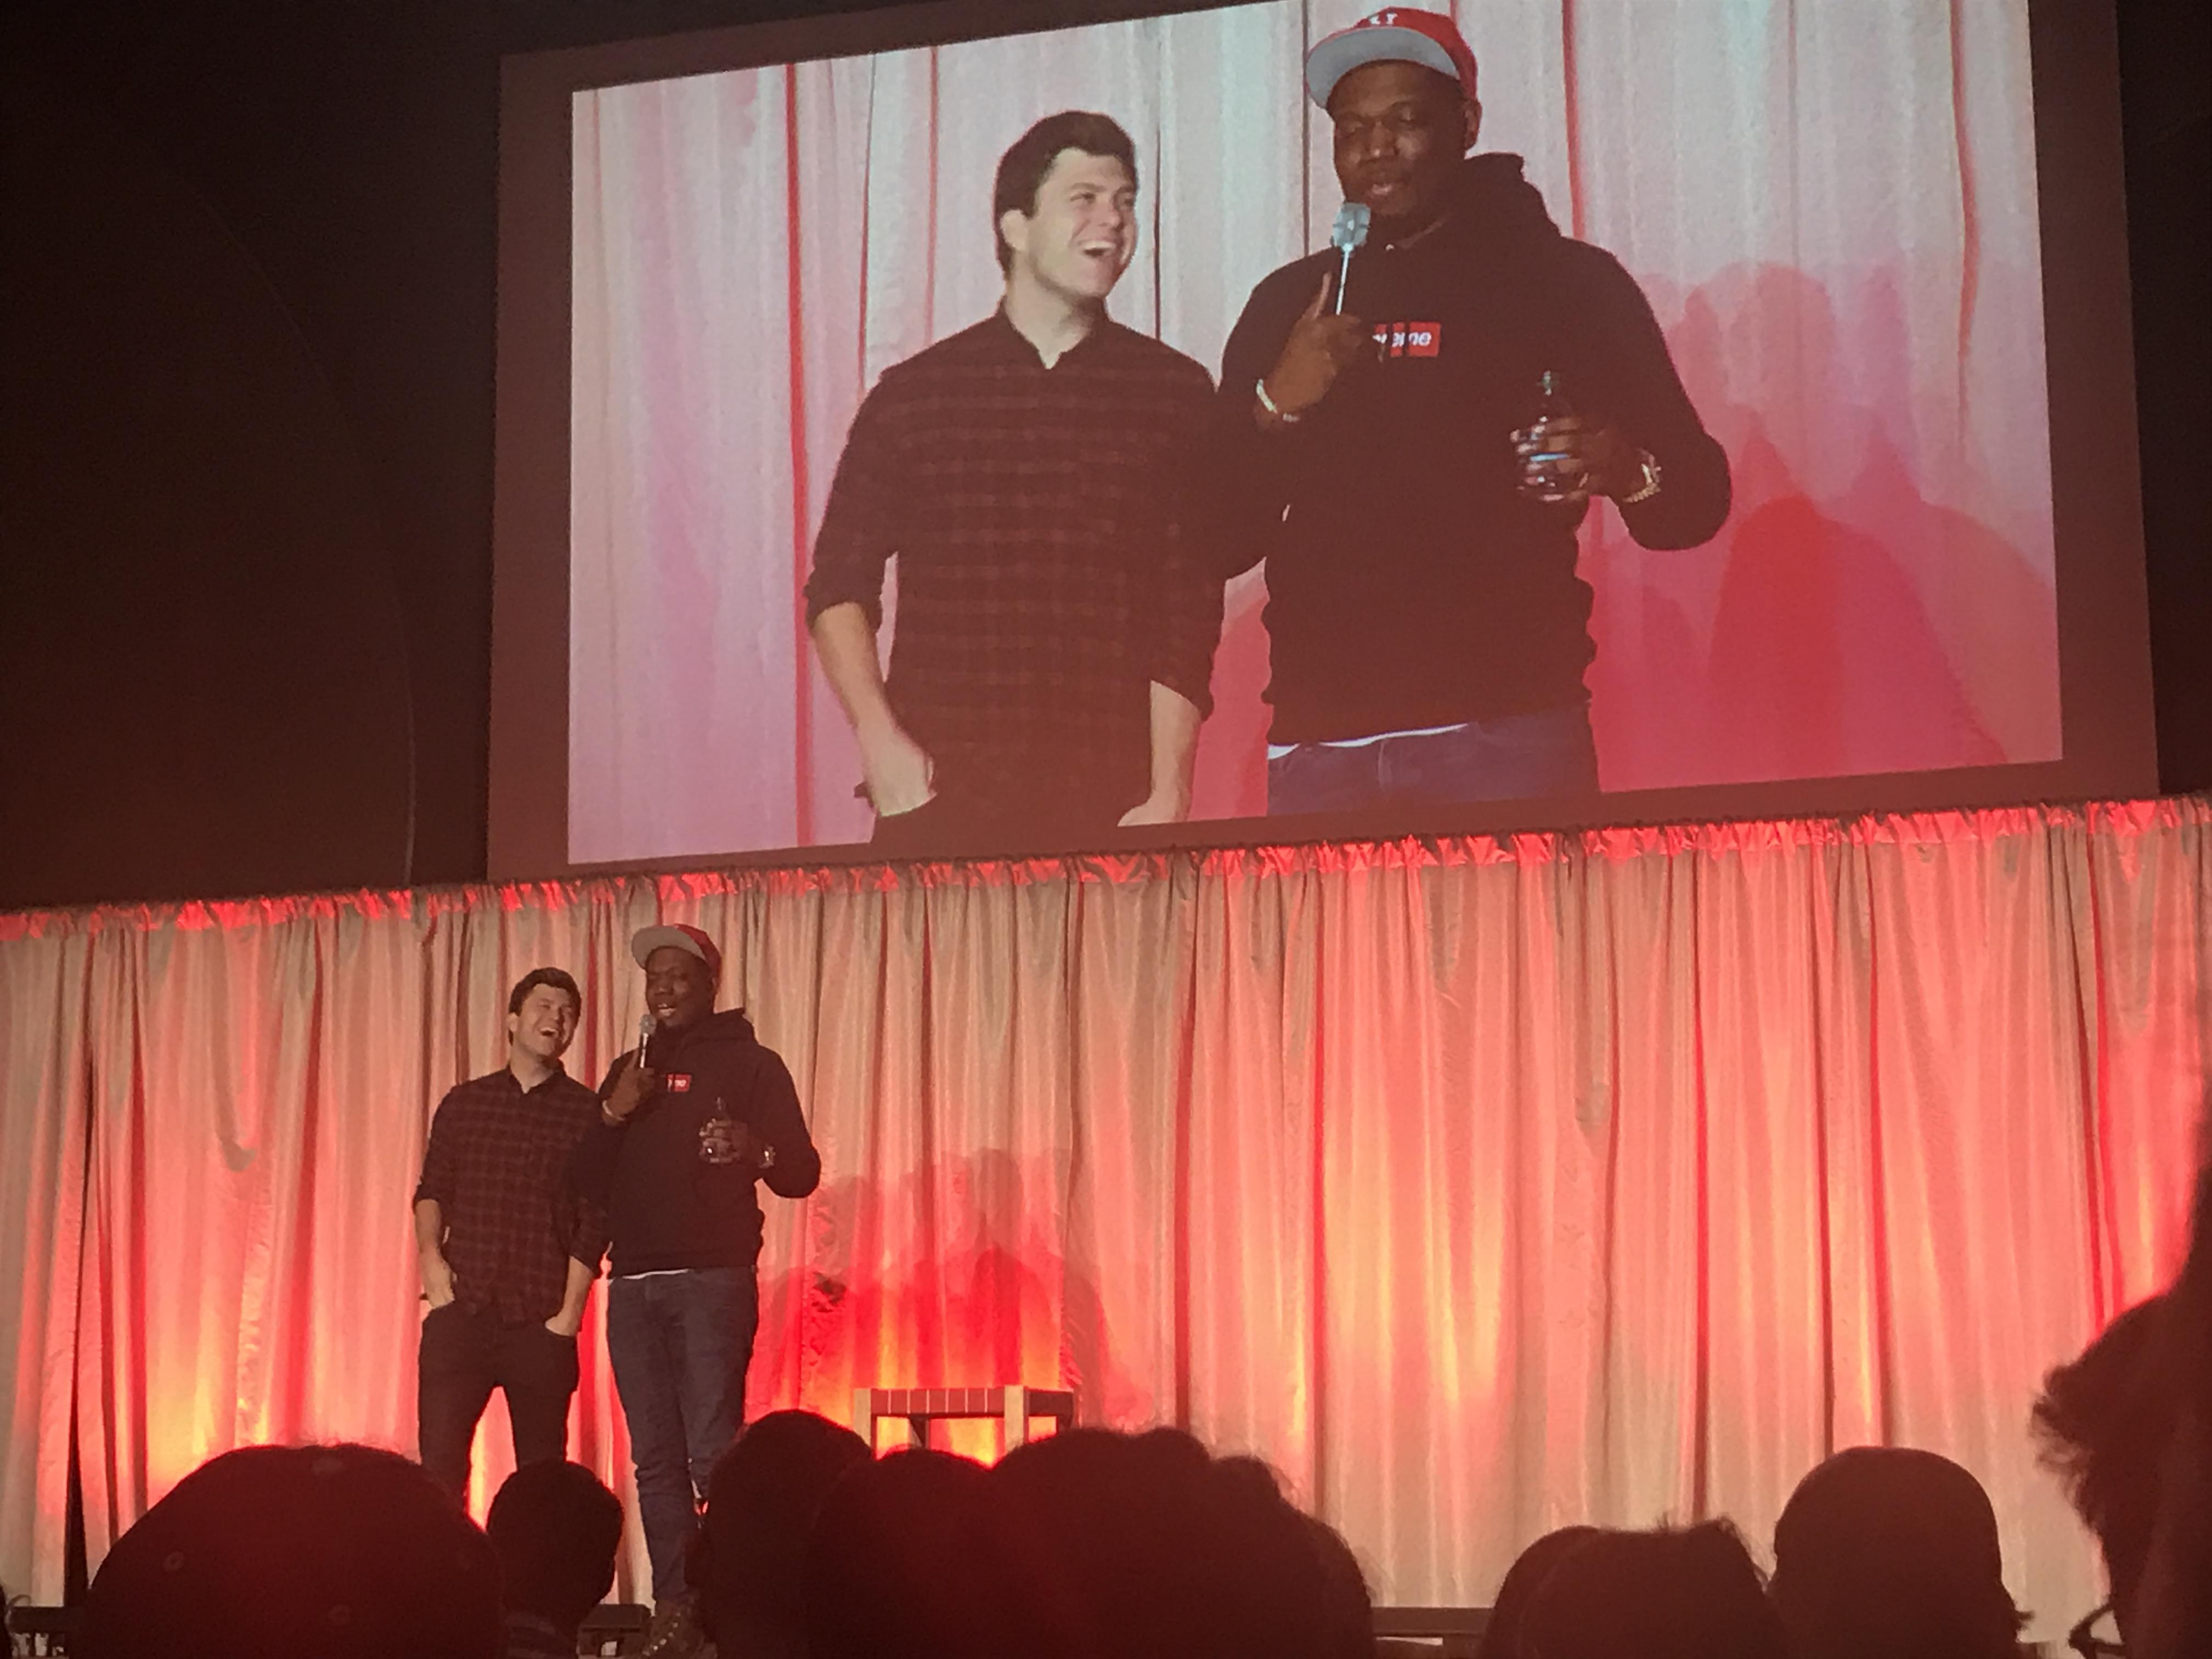 Saturday Night Live comedians talk friendship, growing careers